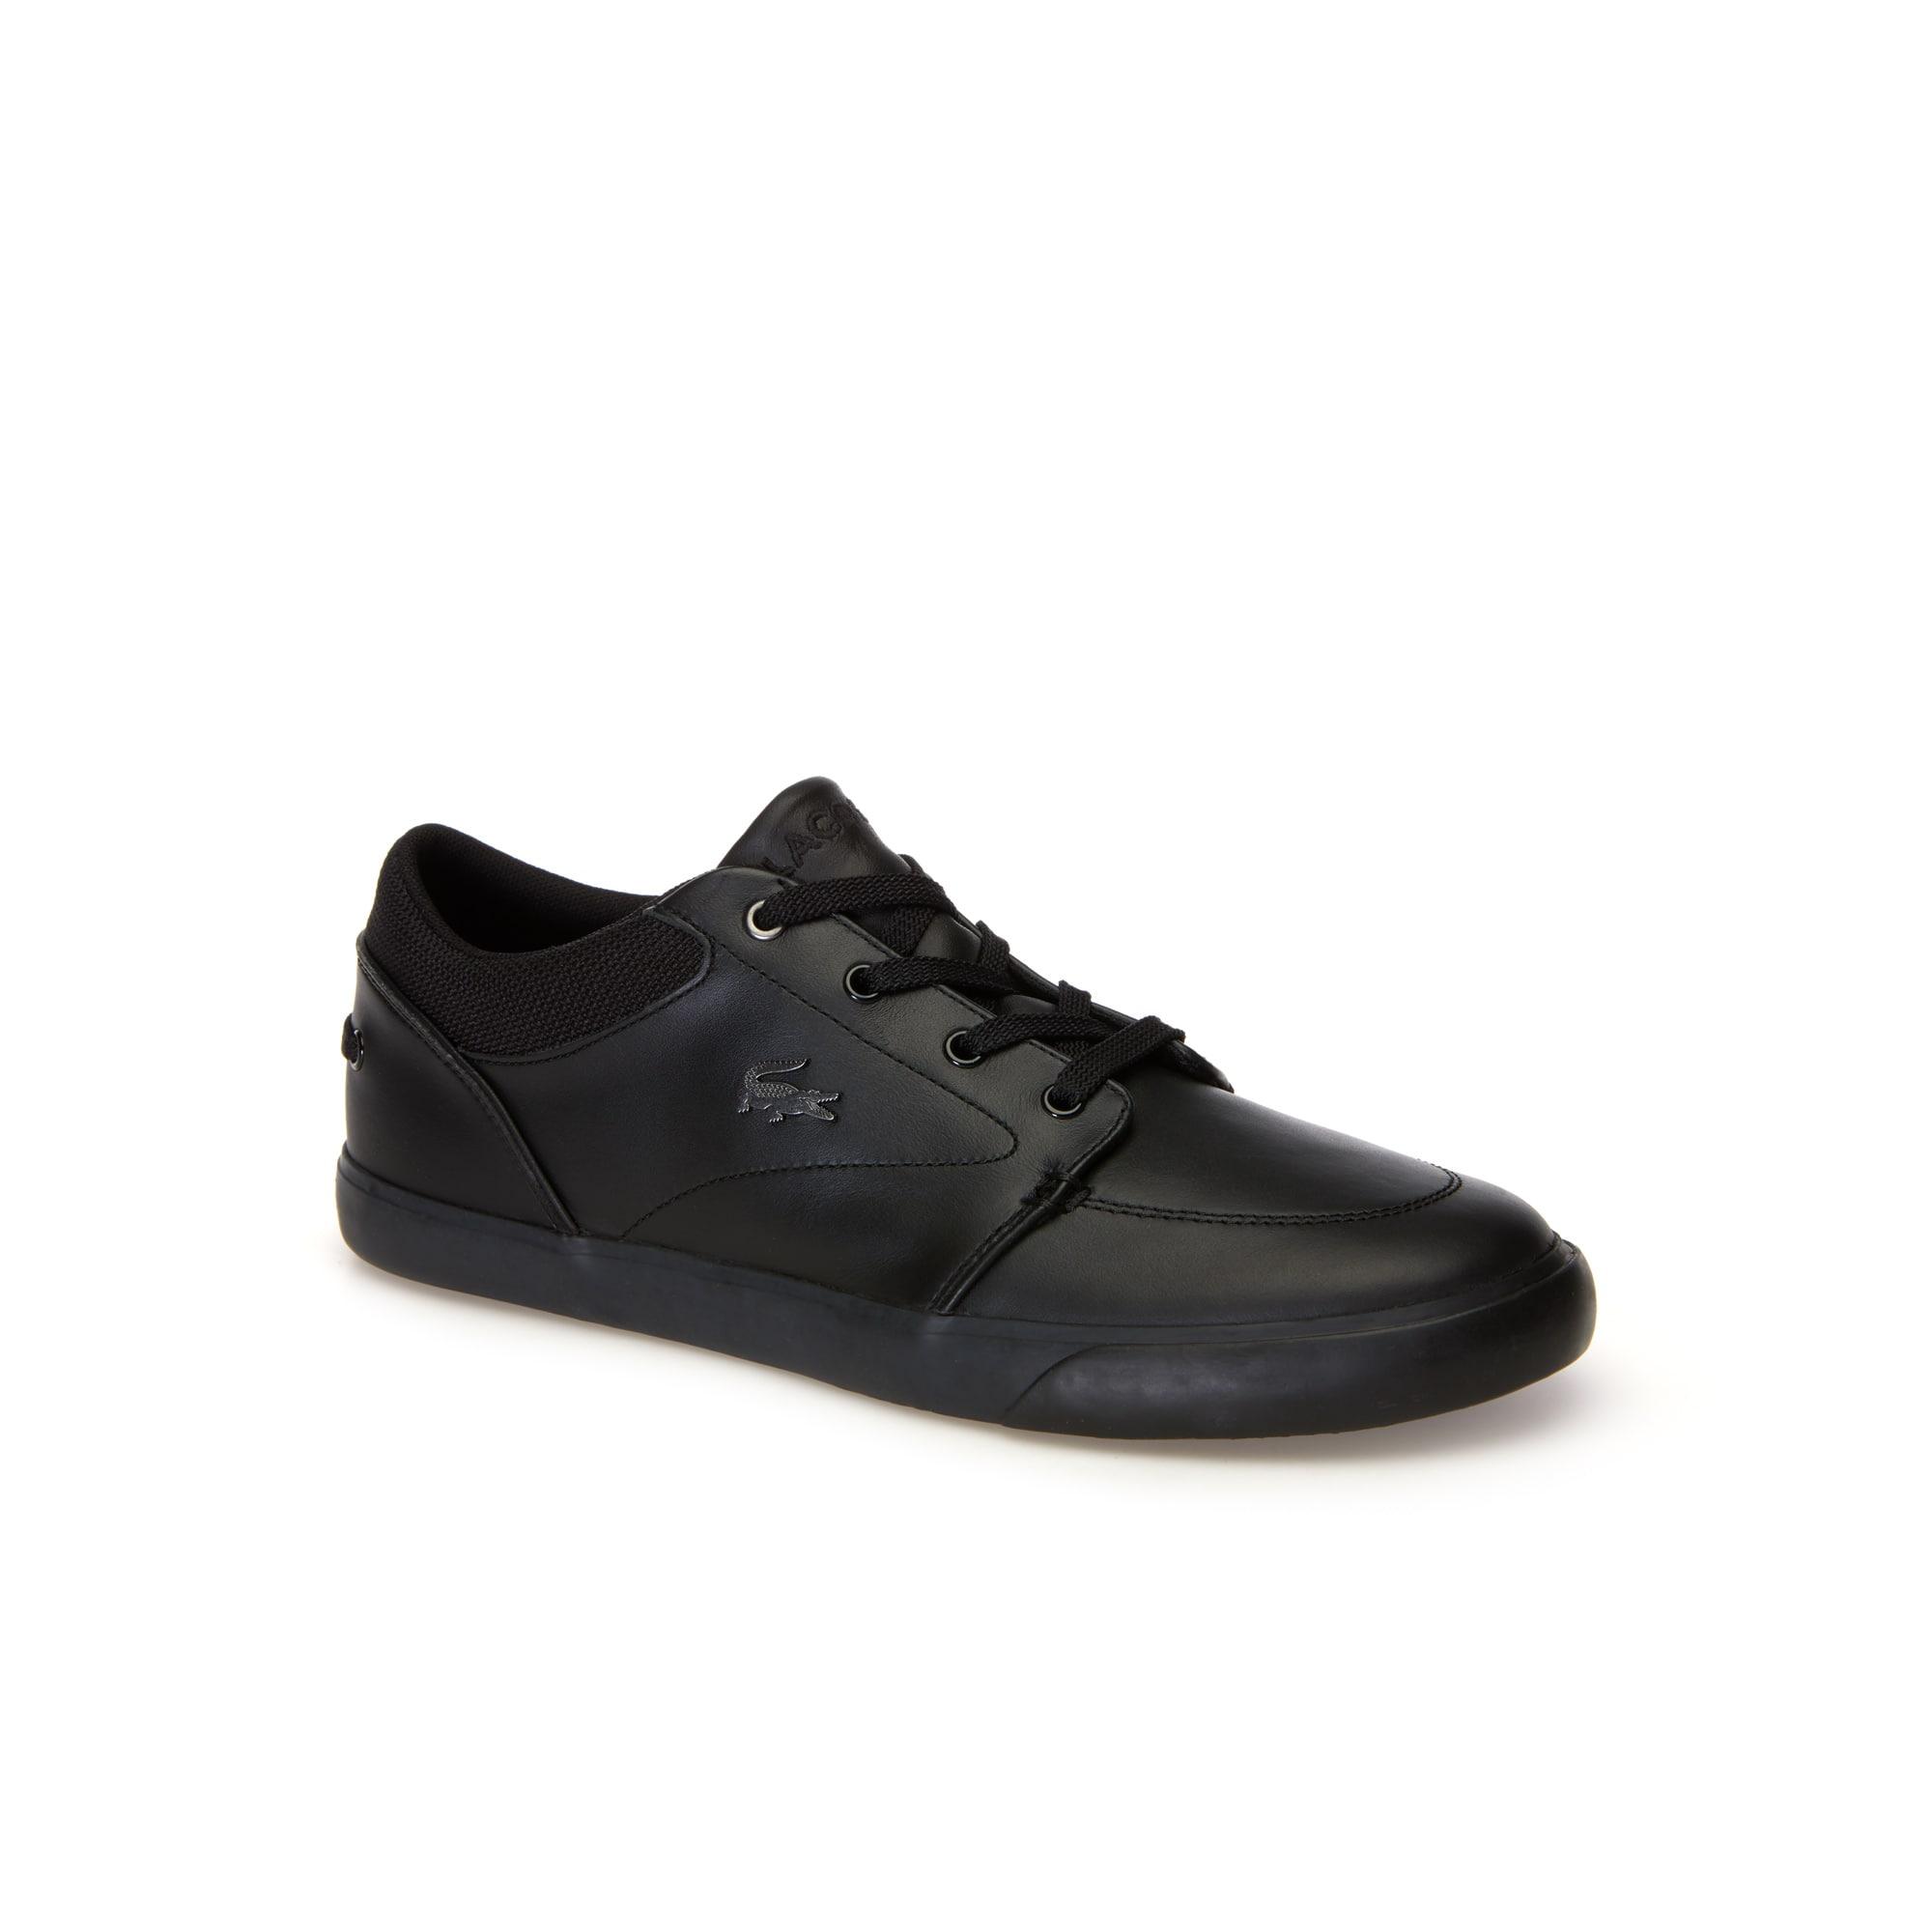 Business Business Schuhe Lacoste Schuhe Für Lacoste MännerHerrenschuhe Schuhe Für Für MännerHerrenschuhe Business sdxtQrCh